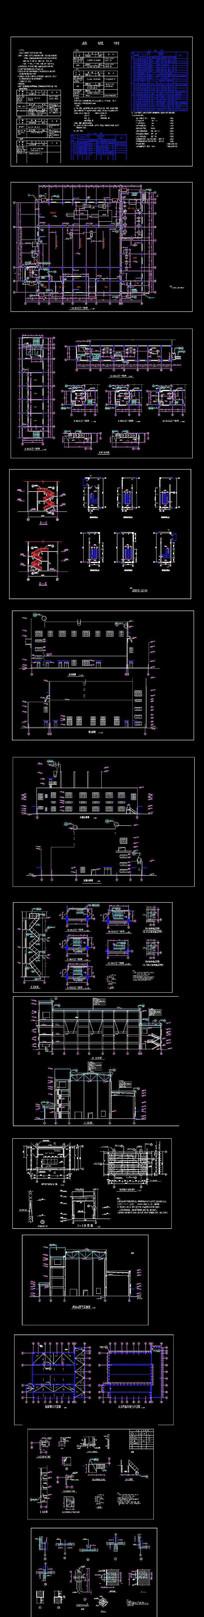 供热站CAD设计图